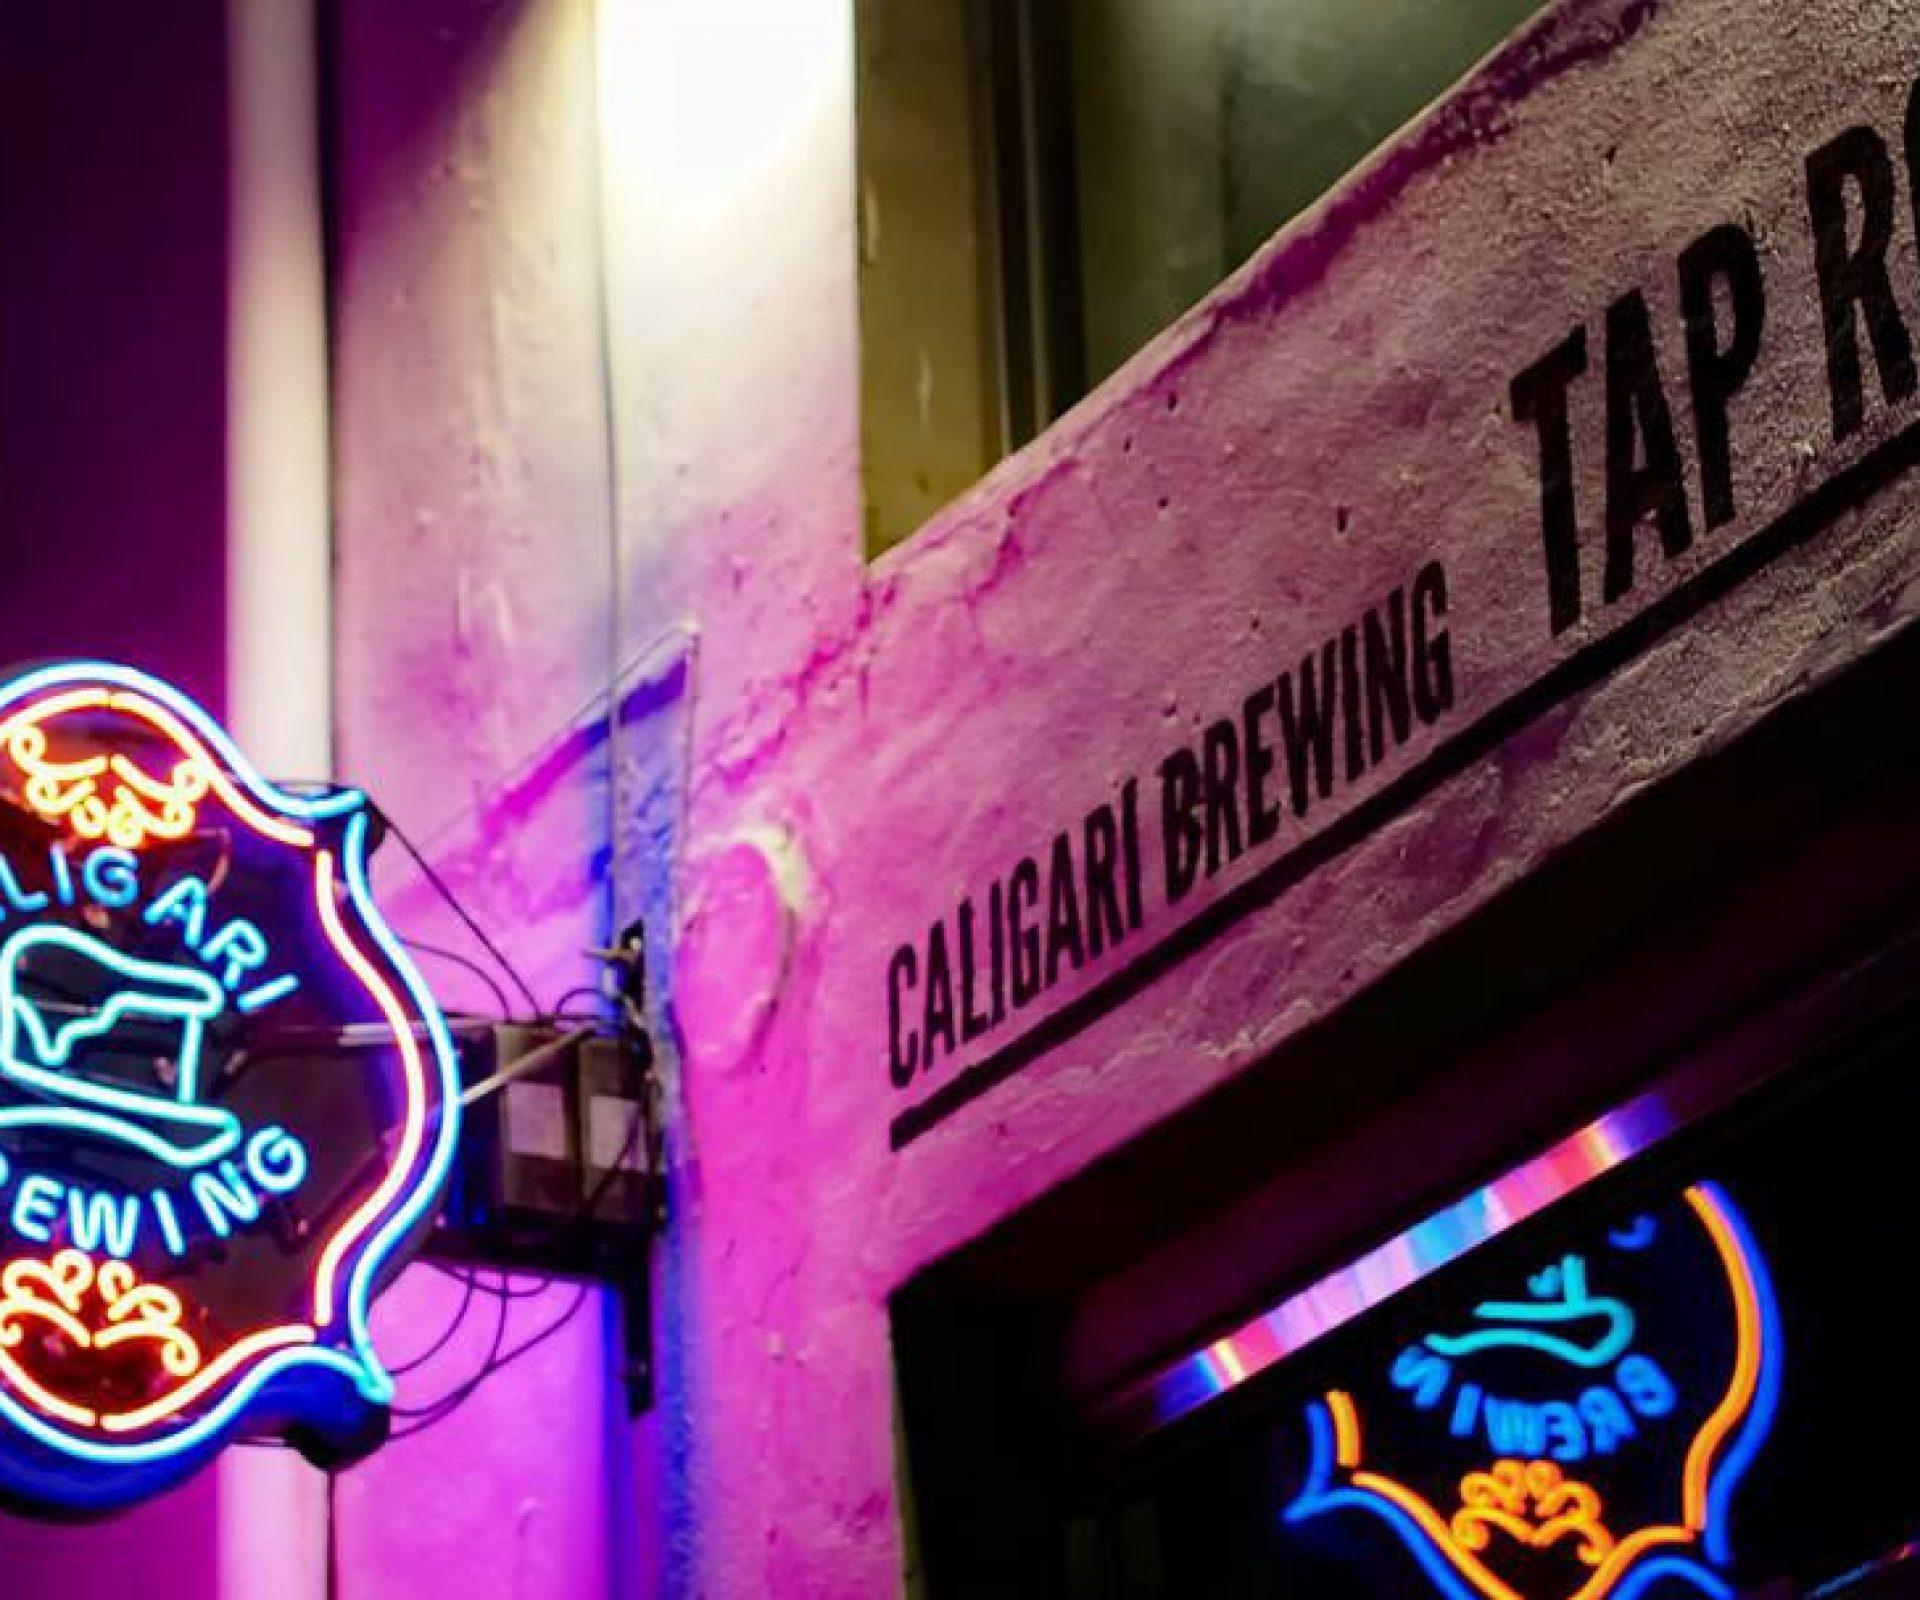 Caligari Brewing | Jung-gu, Incheon